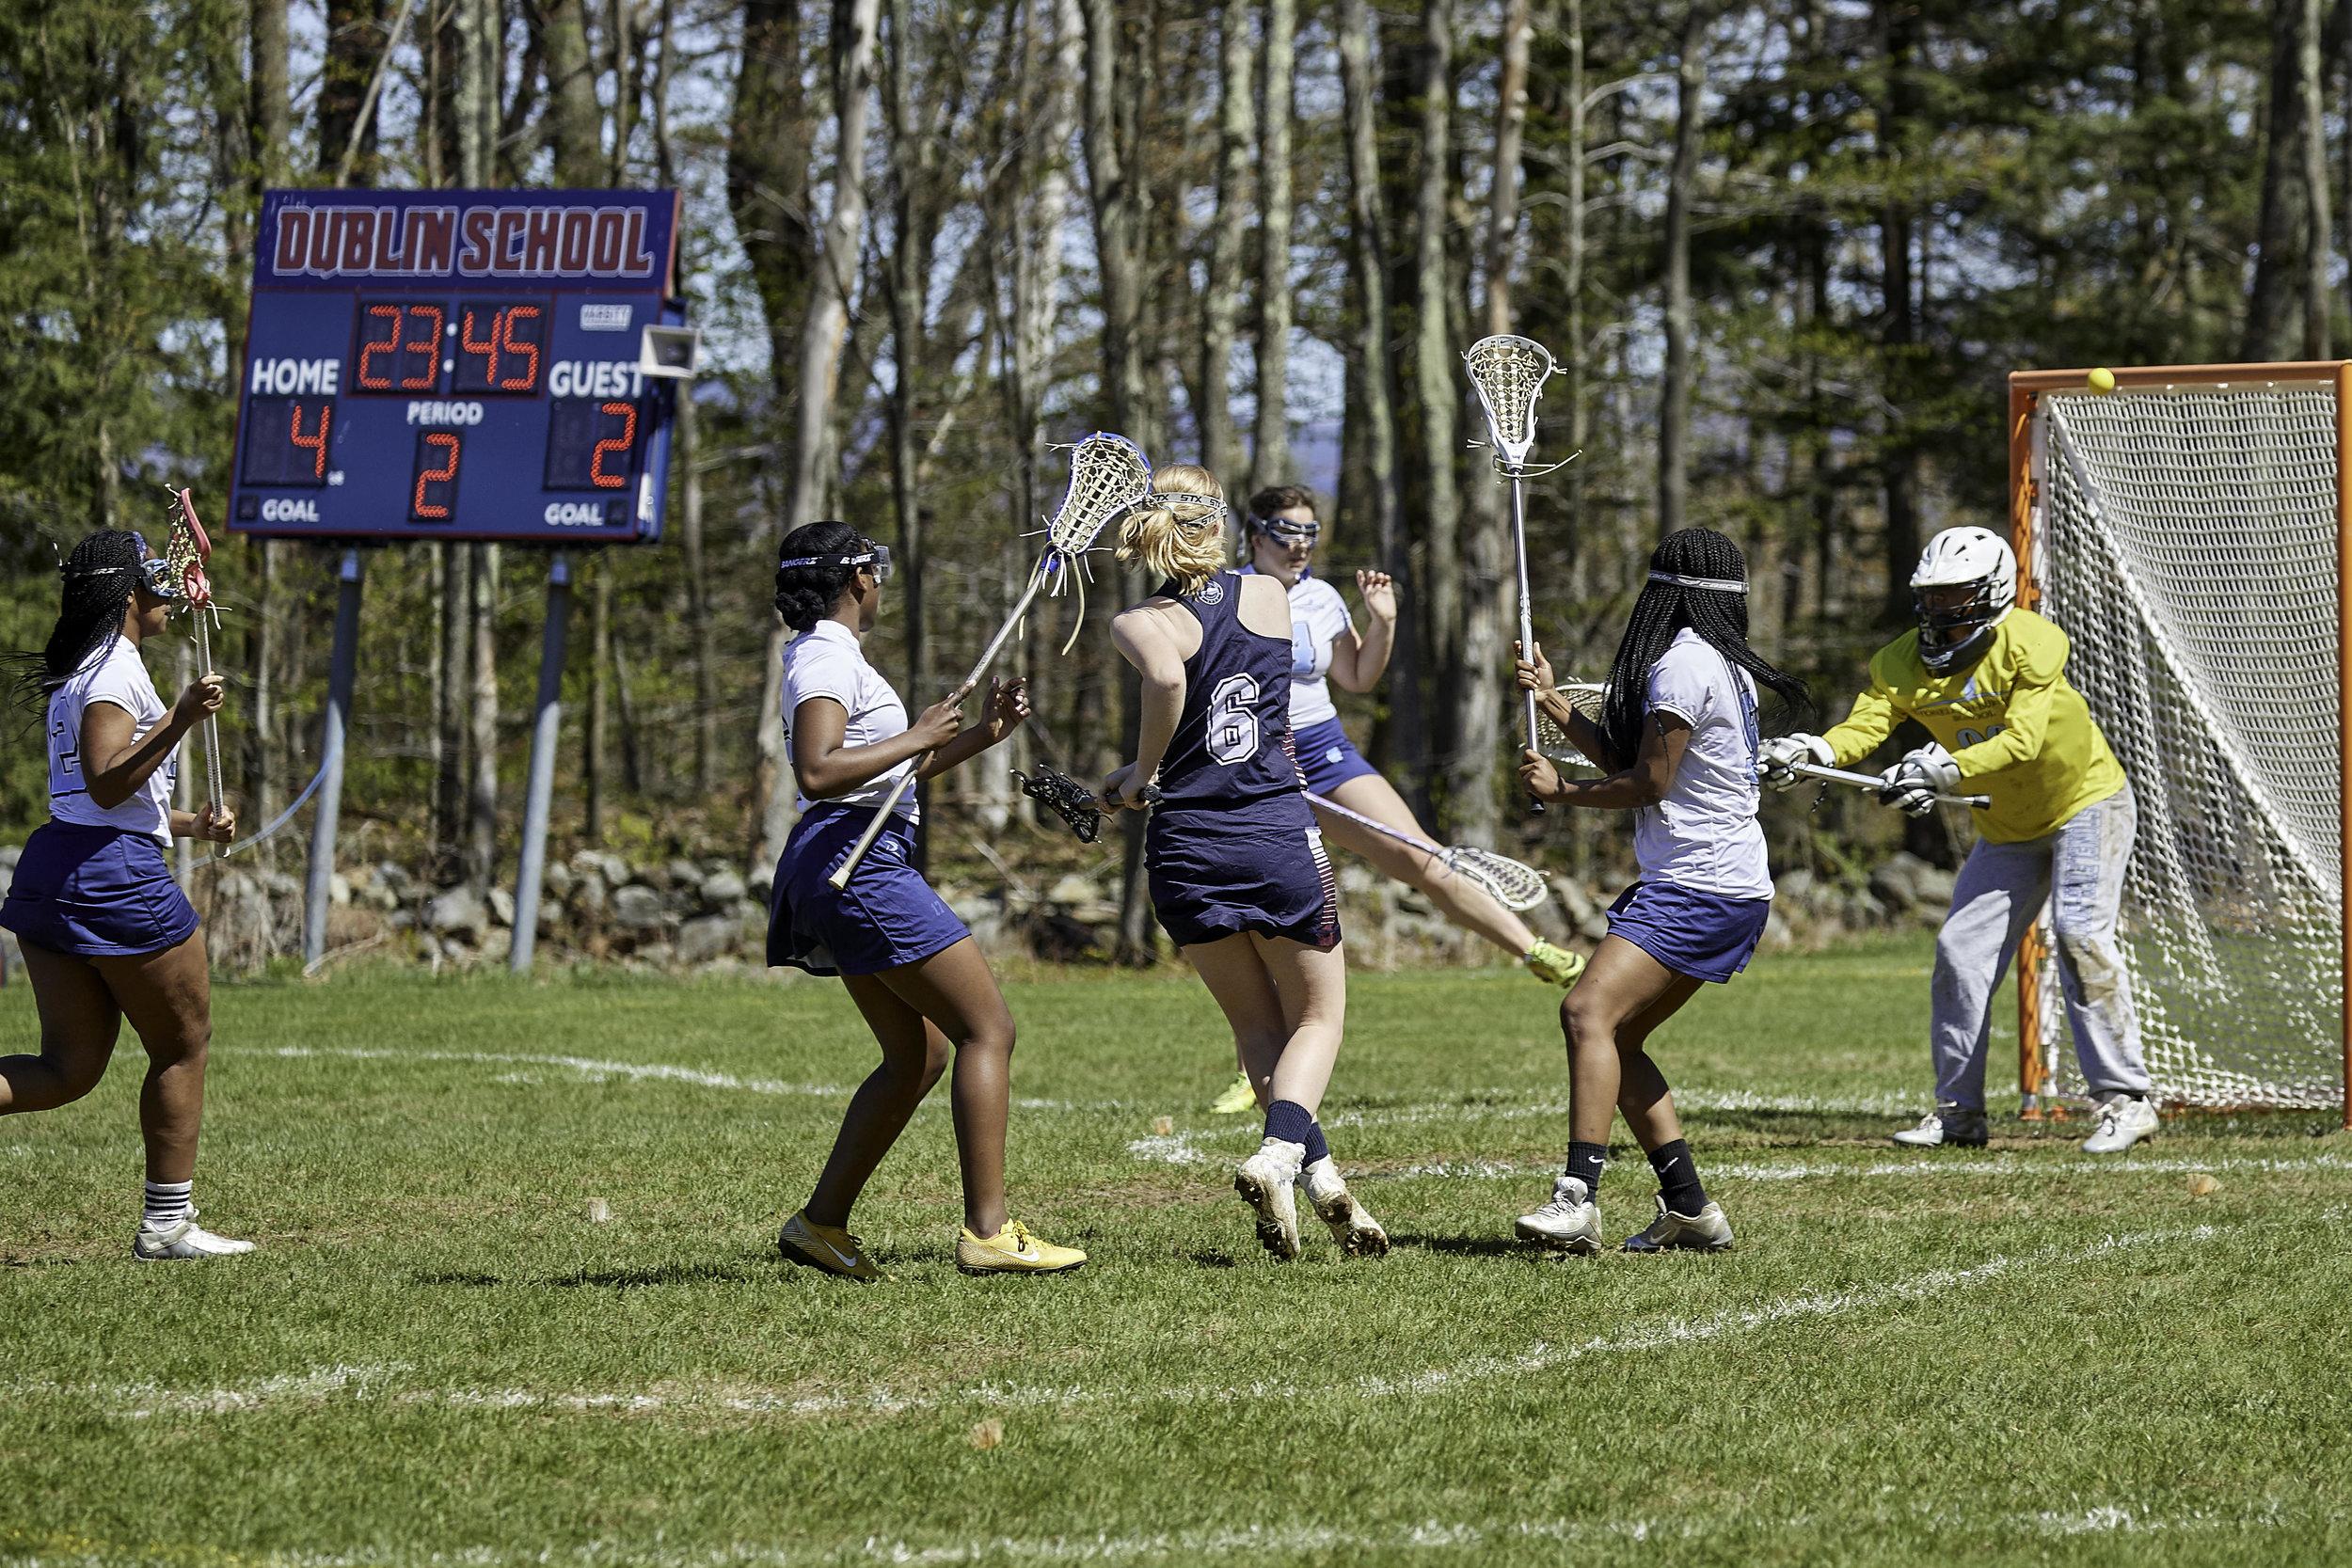 Girls Lacrosse vs. Stoneleigh Burnham School - May 11, 2019 - May 10, 2019193302.jpg